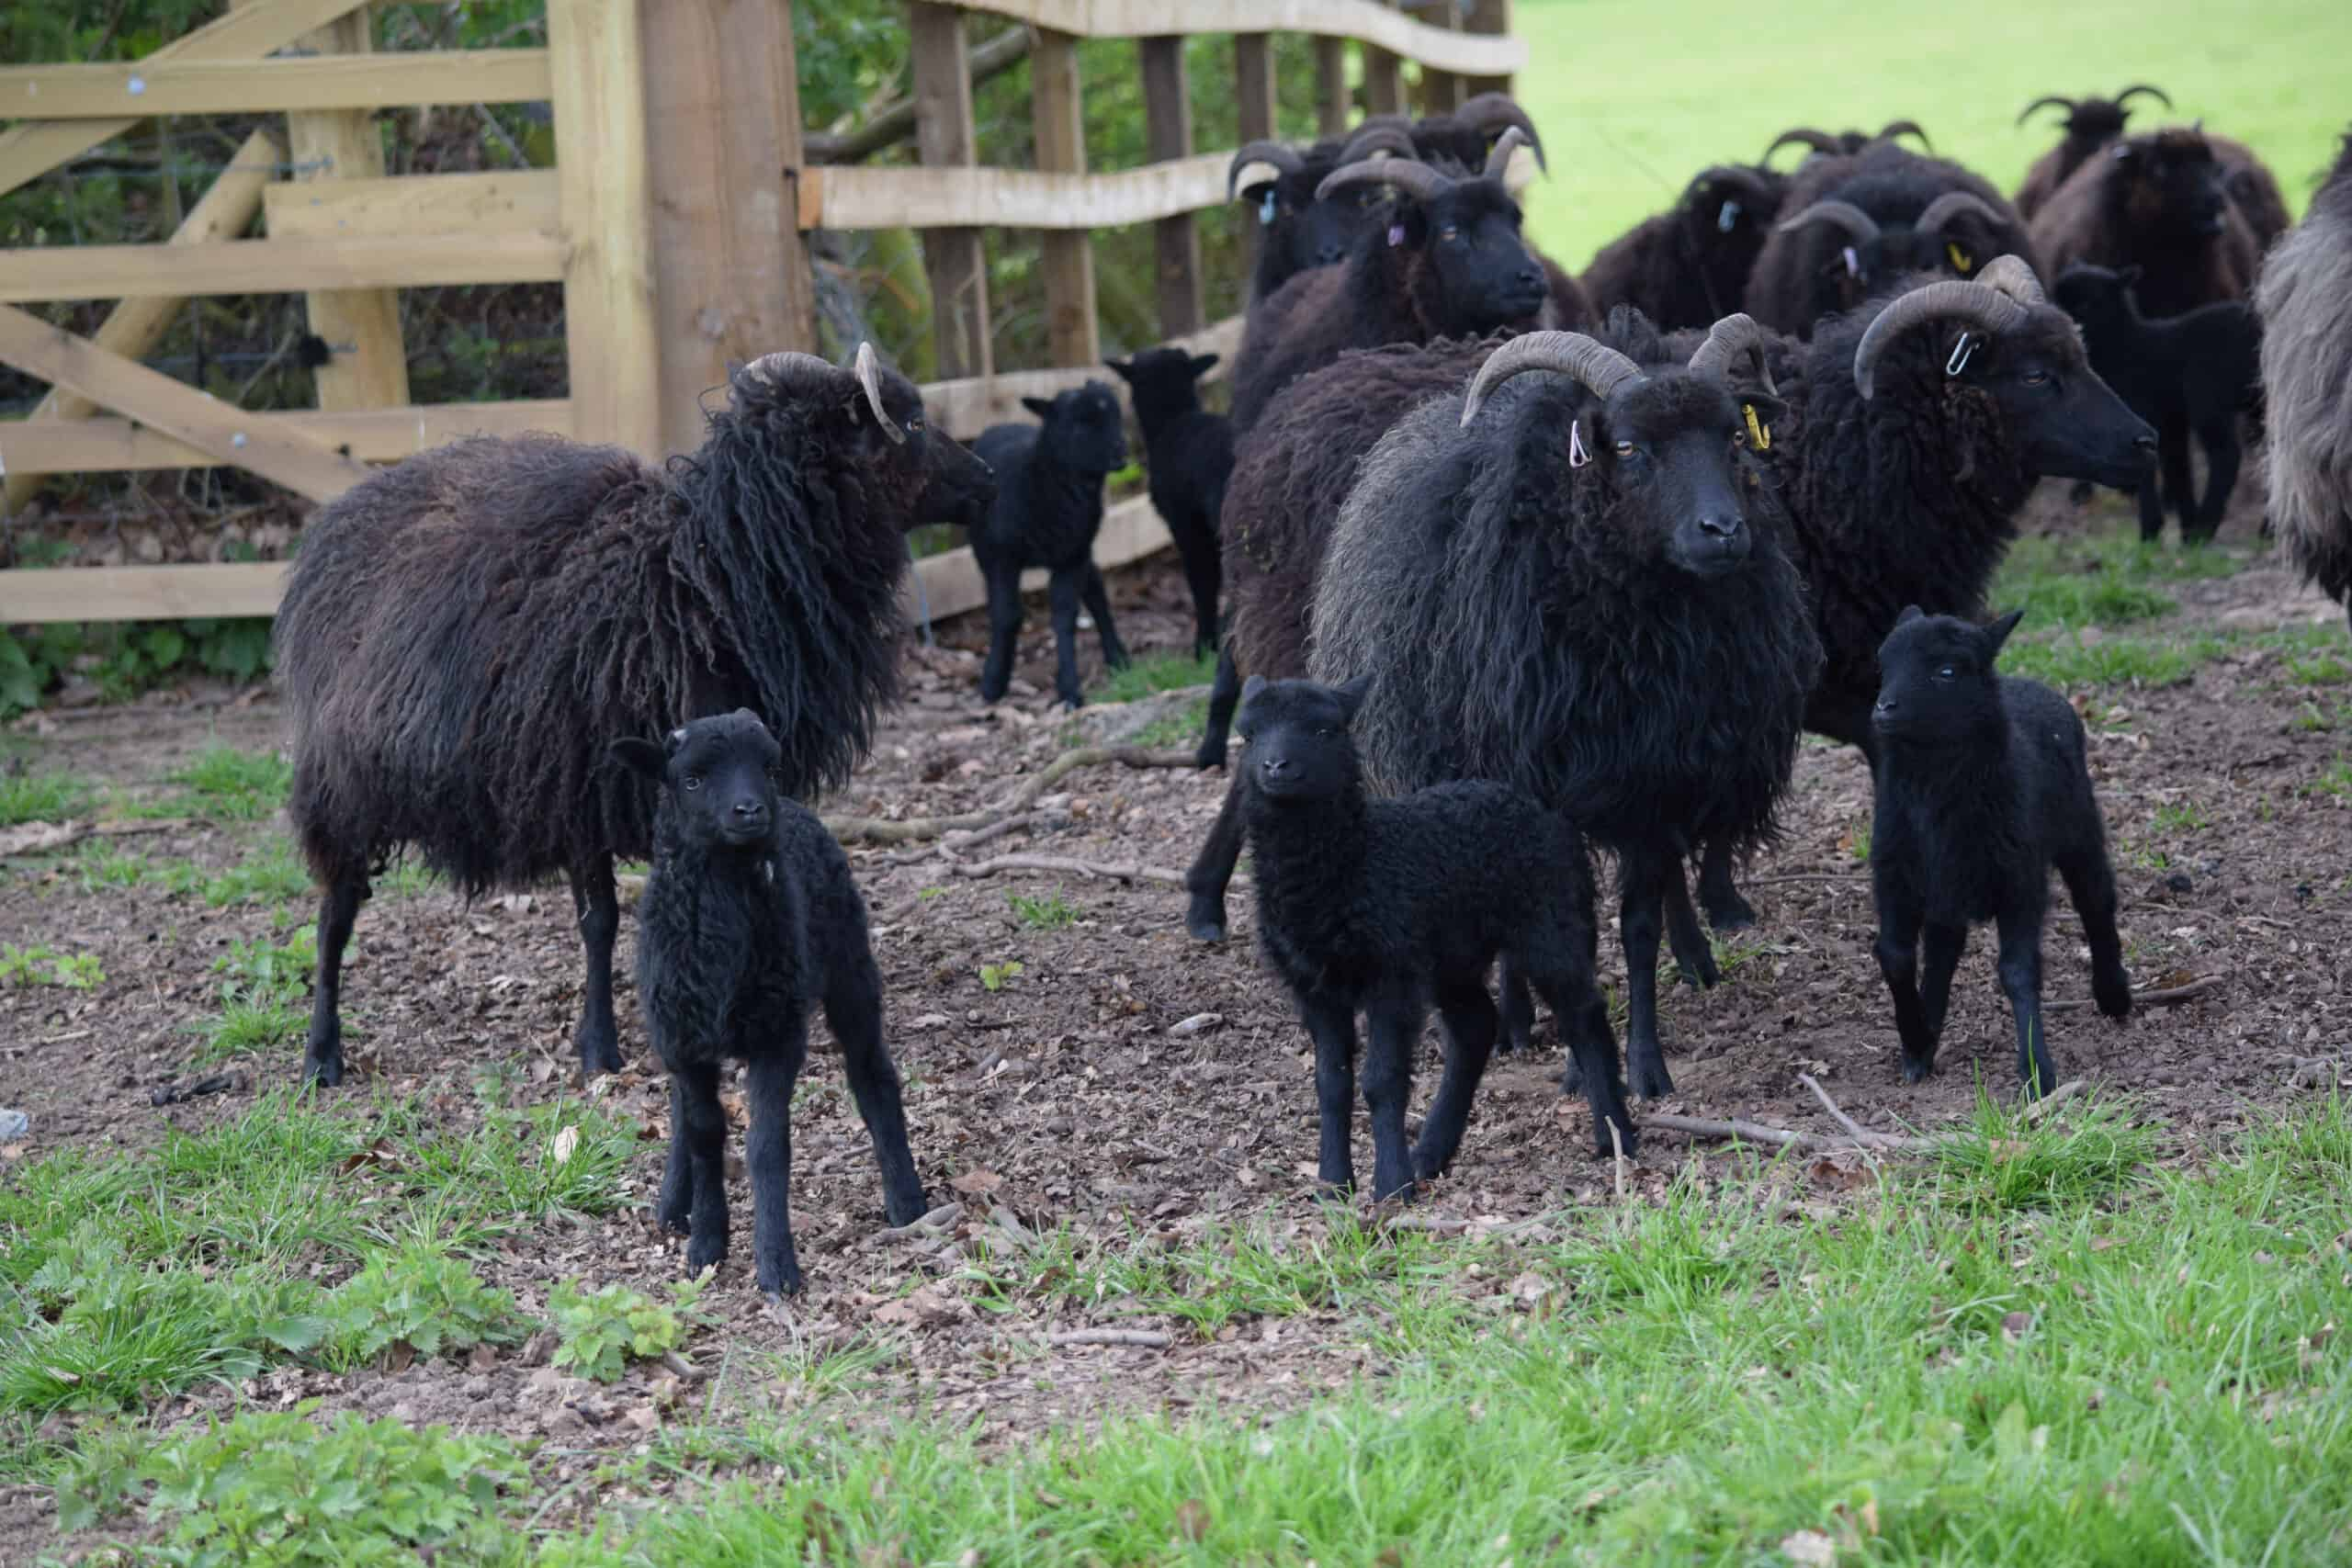 A flock of black sheep.